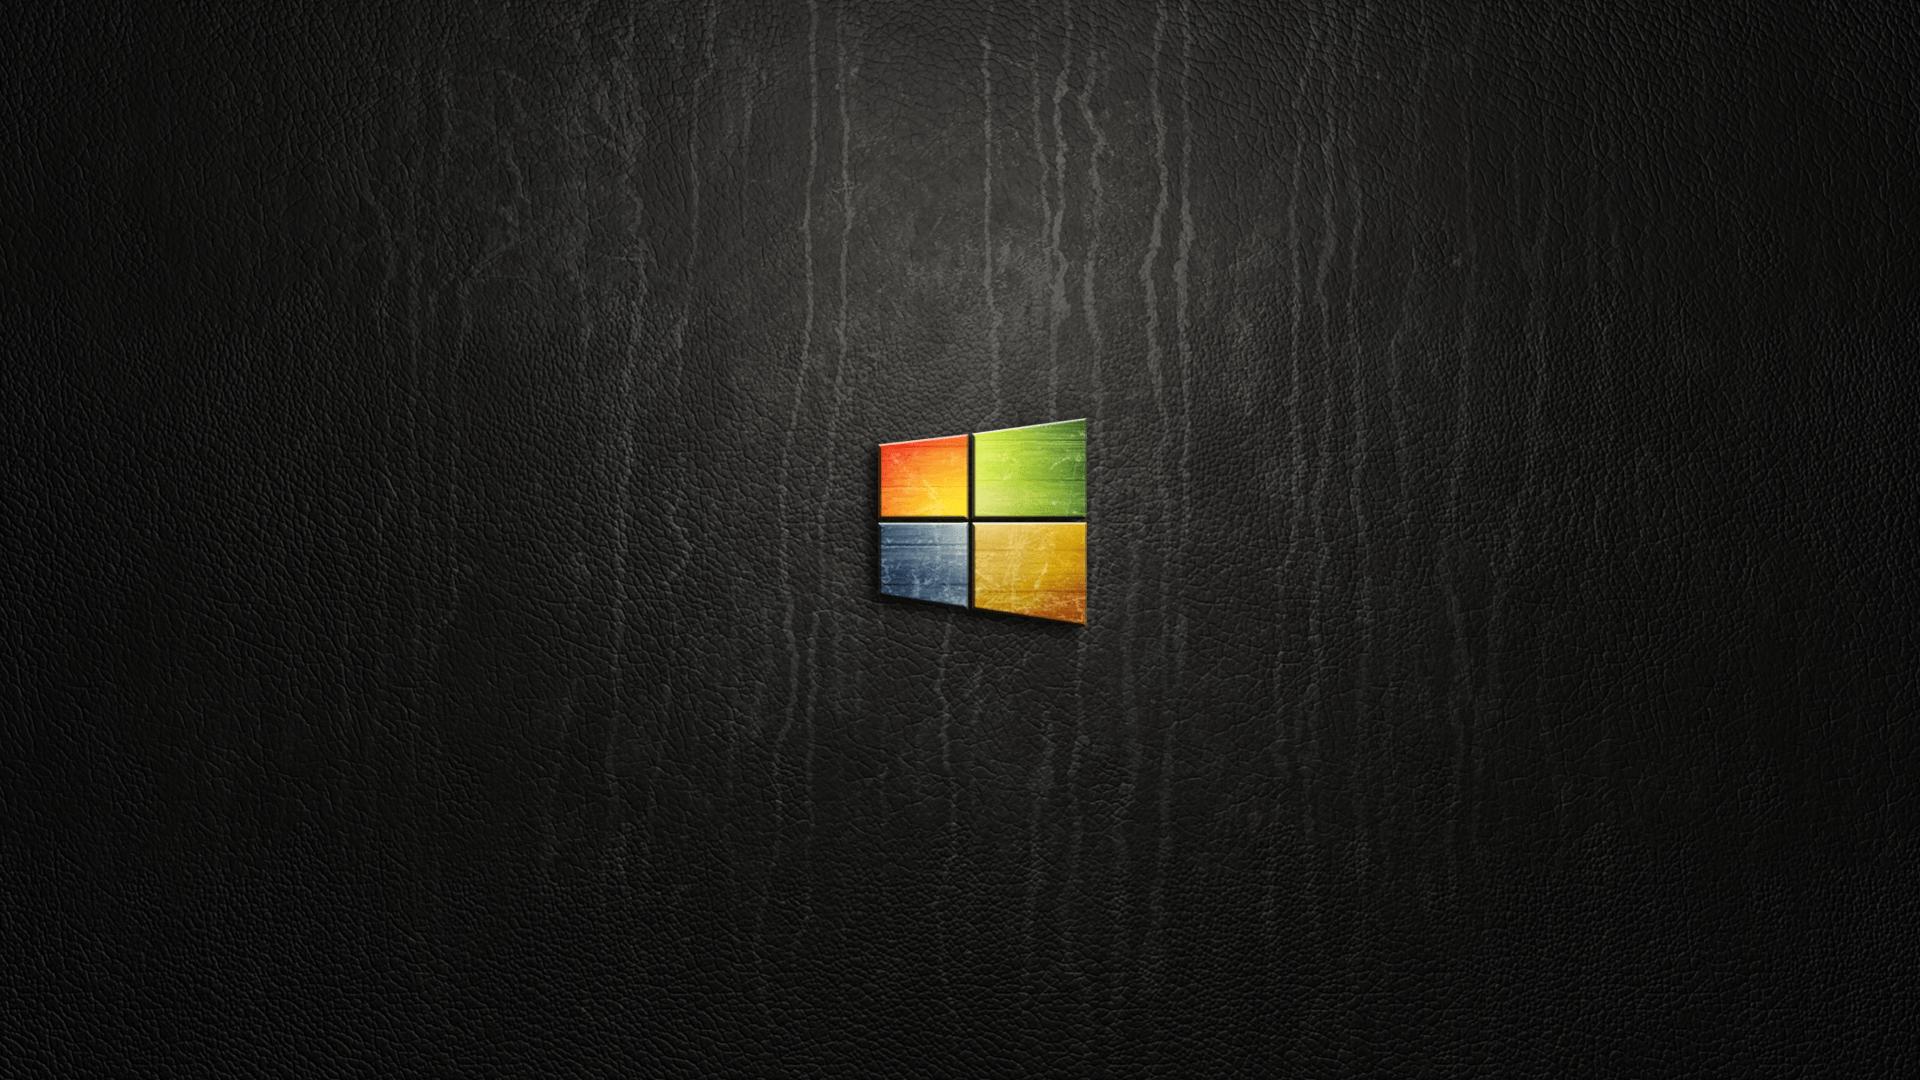 Black Windows 10 Hd Wallpapers Top Free Black Windows 10 Hd